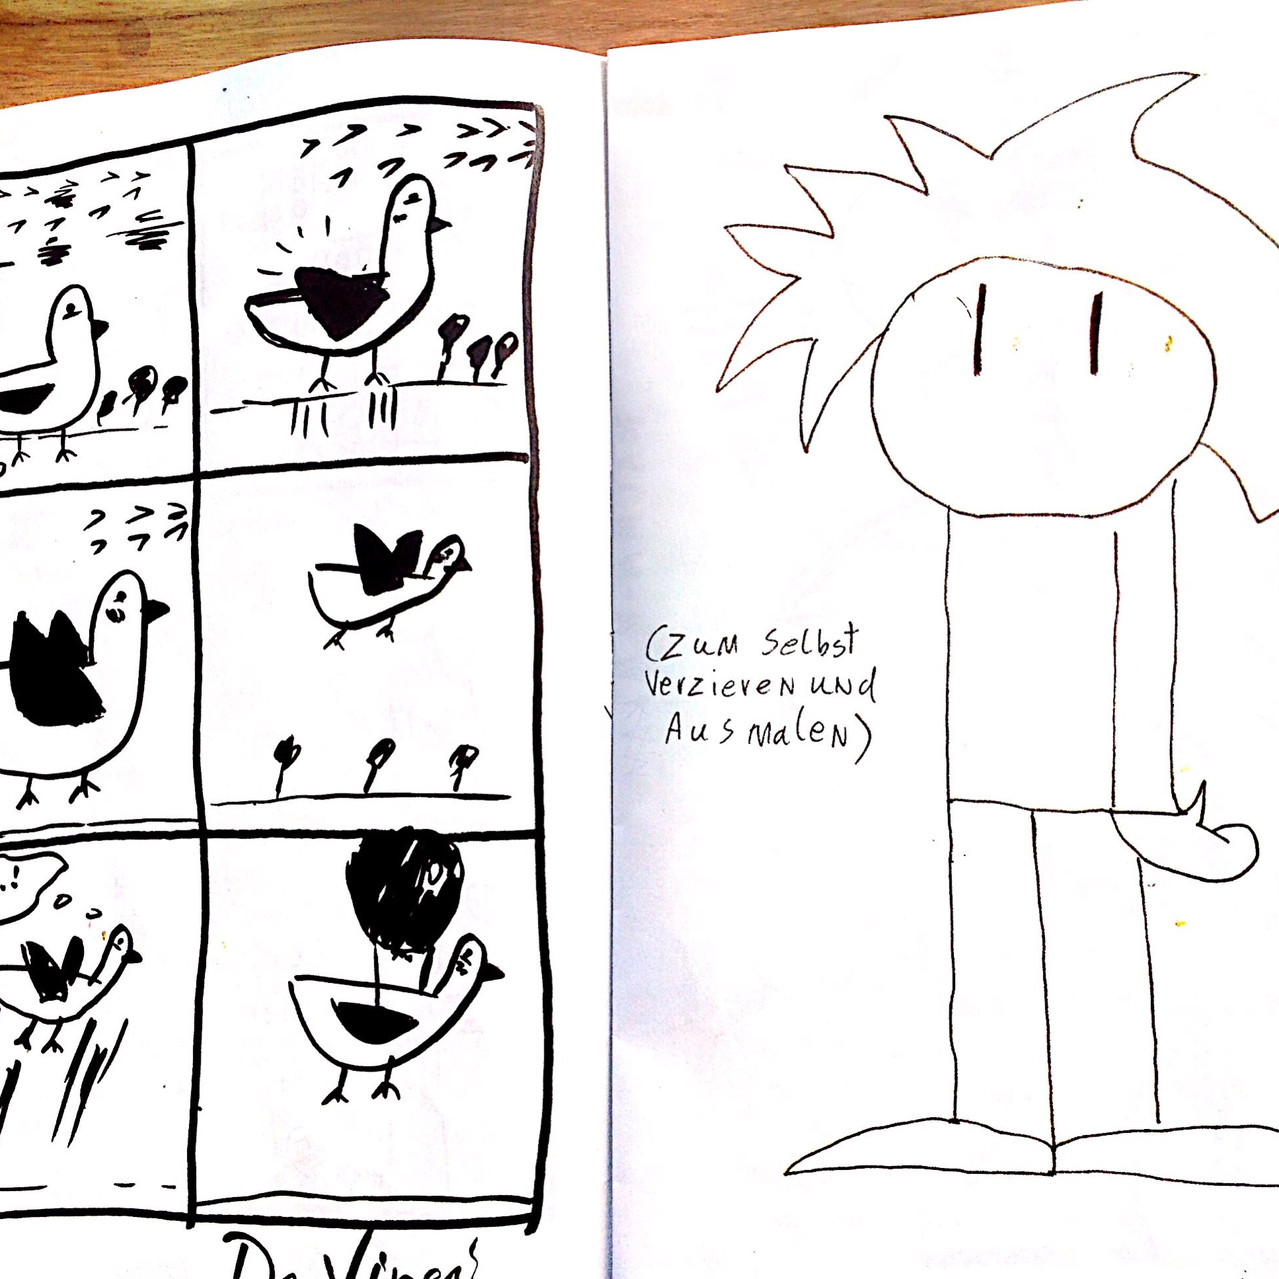 Erstes fertiges Comic: DaVinci